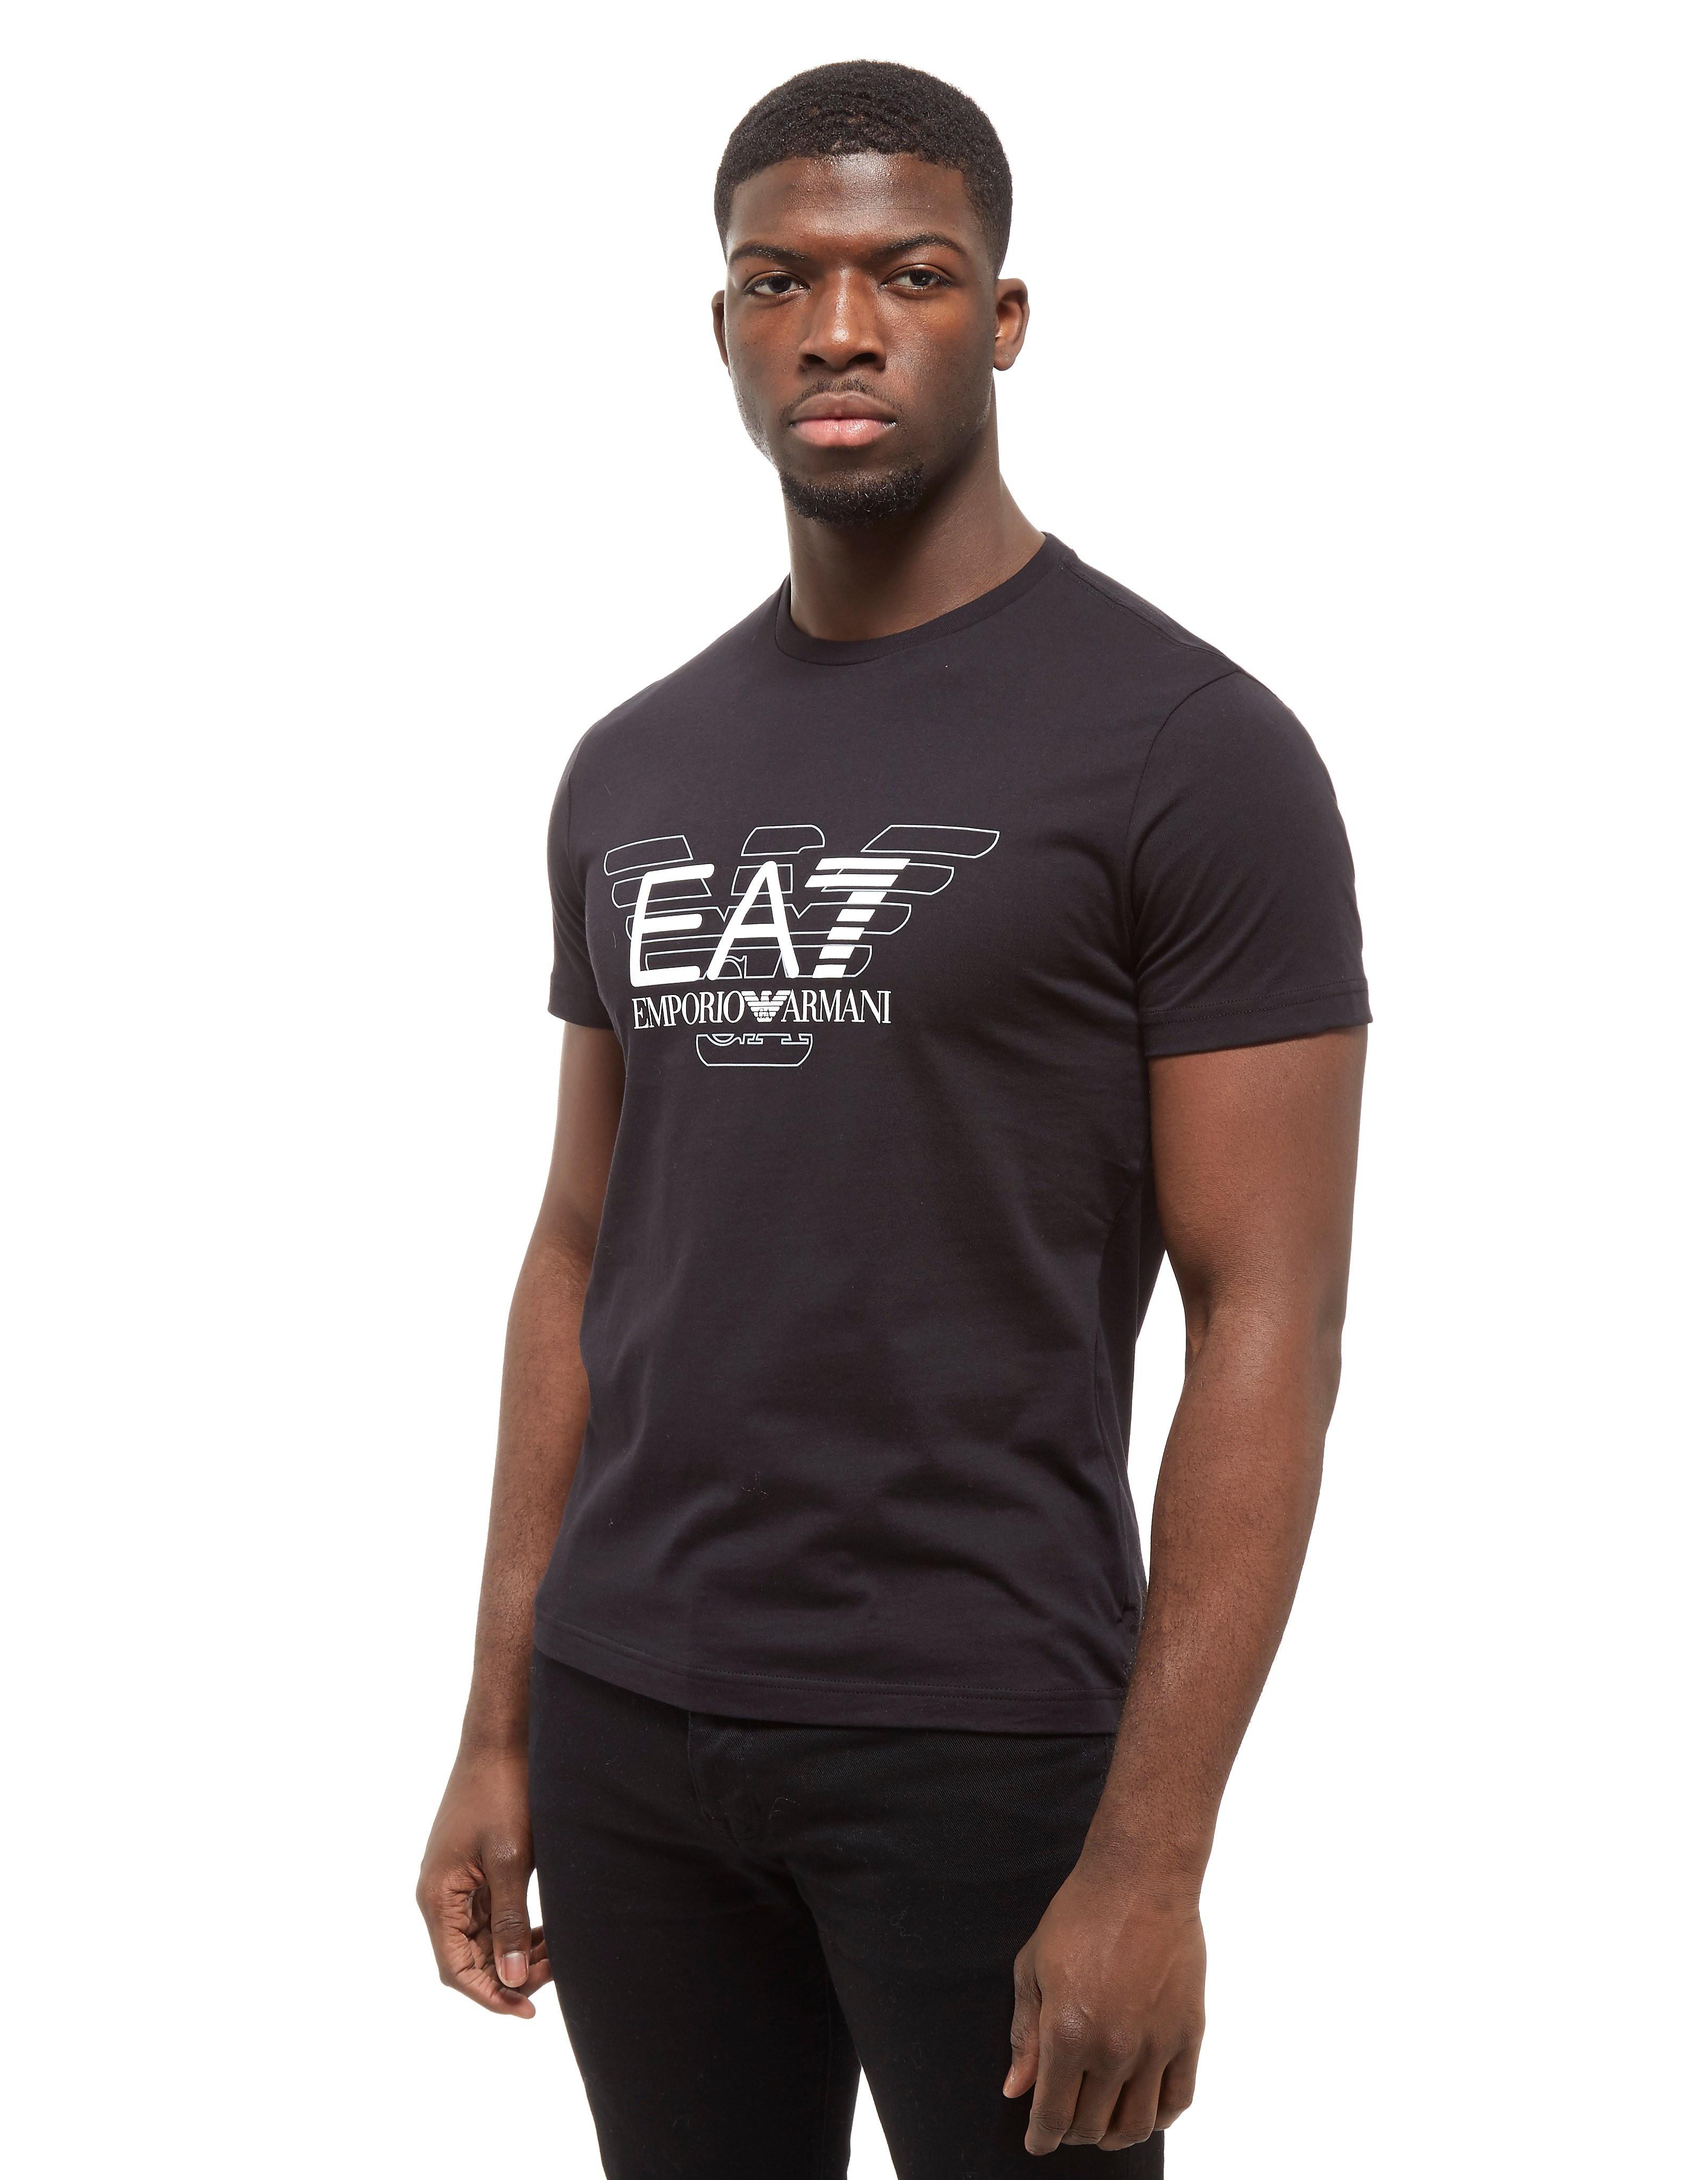 Emporio Armani EA7 Short Sleeve Large Eagle T-Shirt